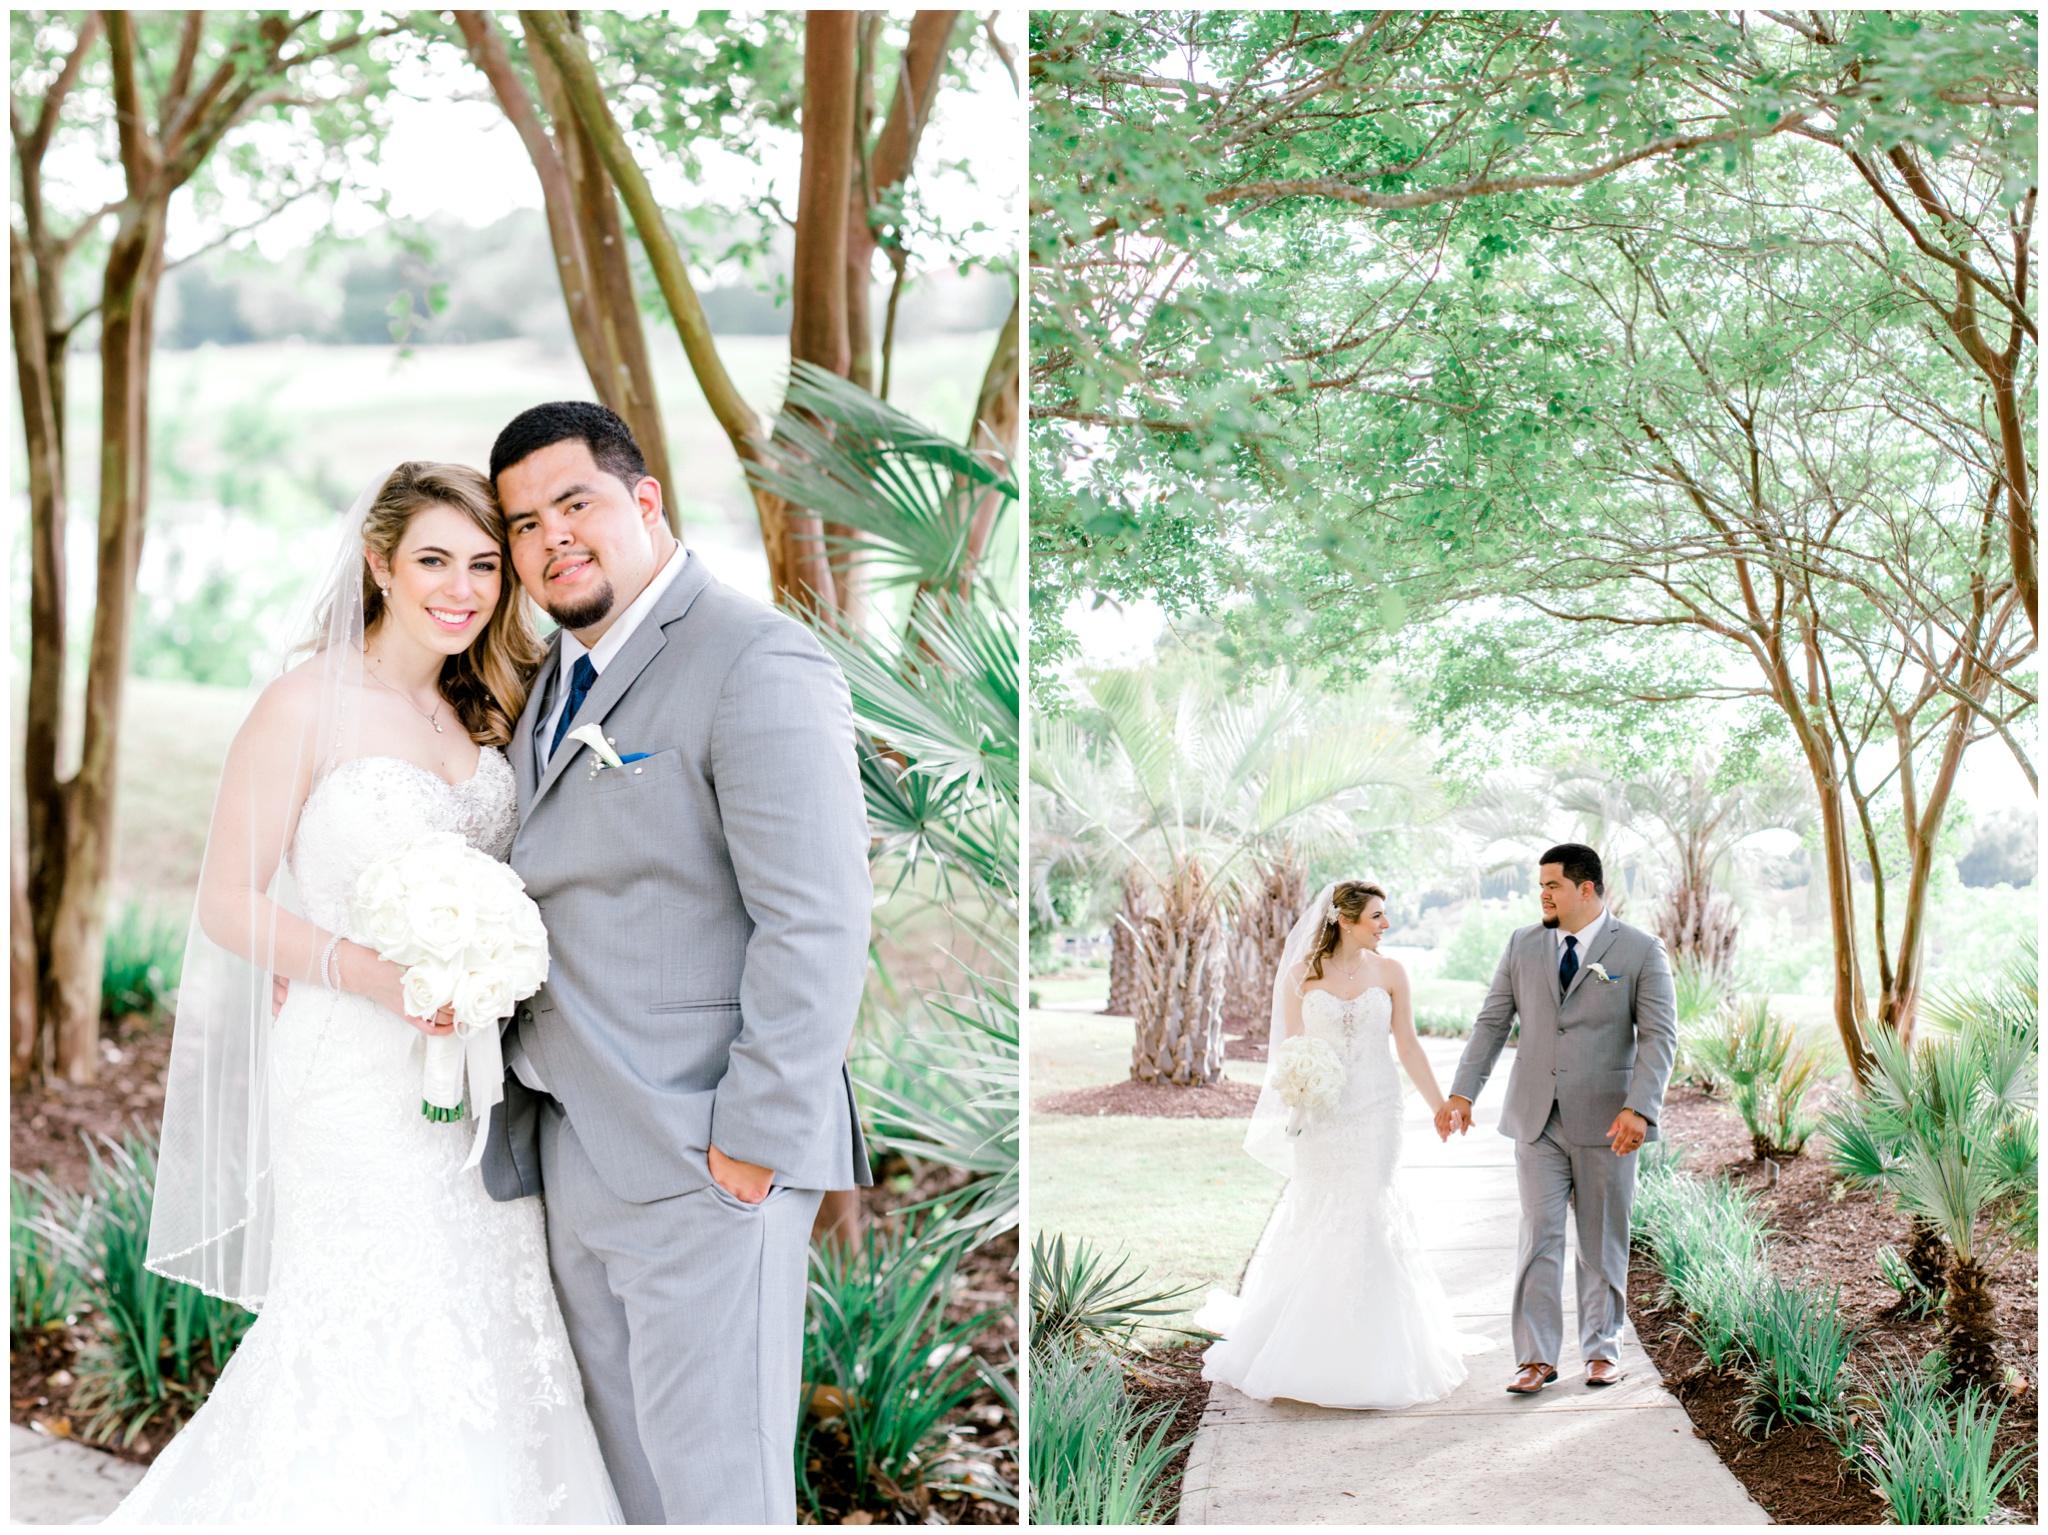 south-carolina-wedding-photographer-43